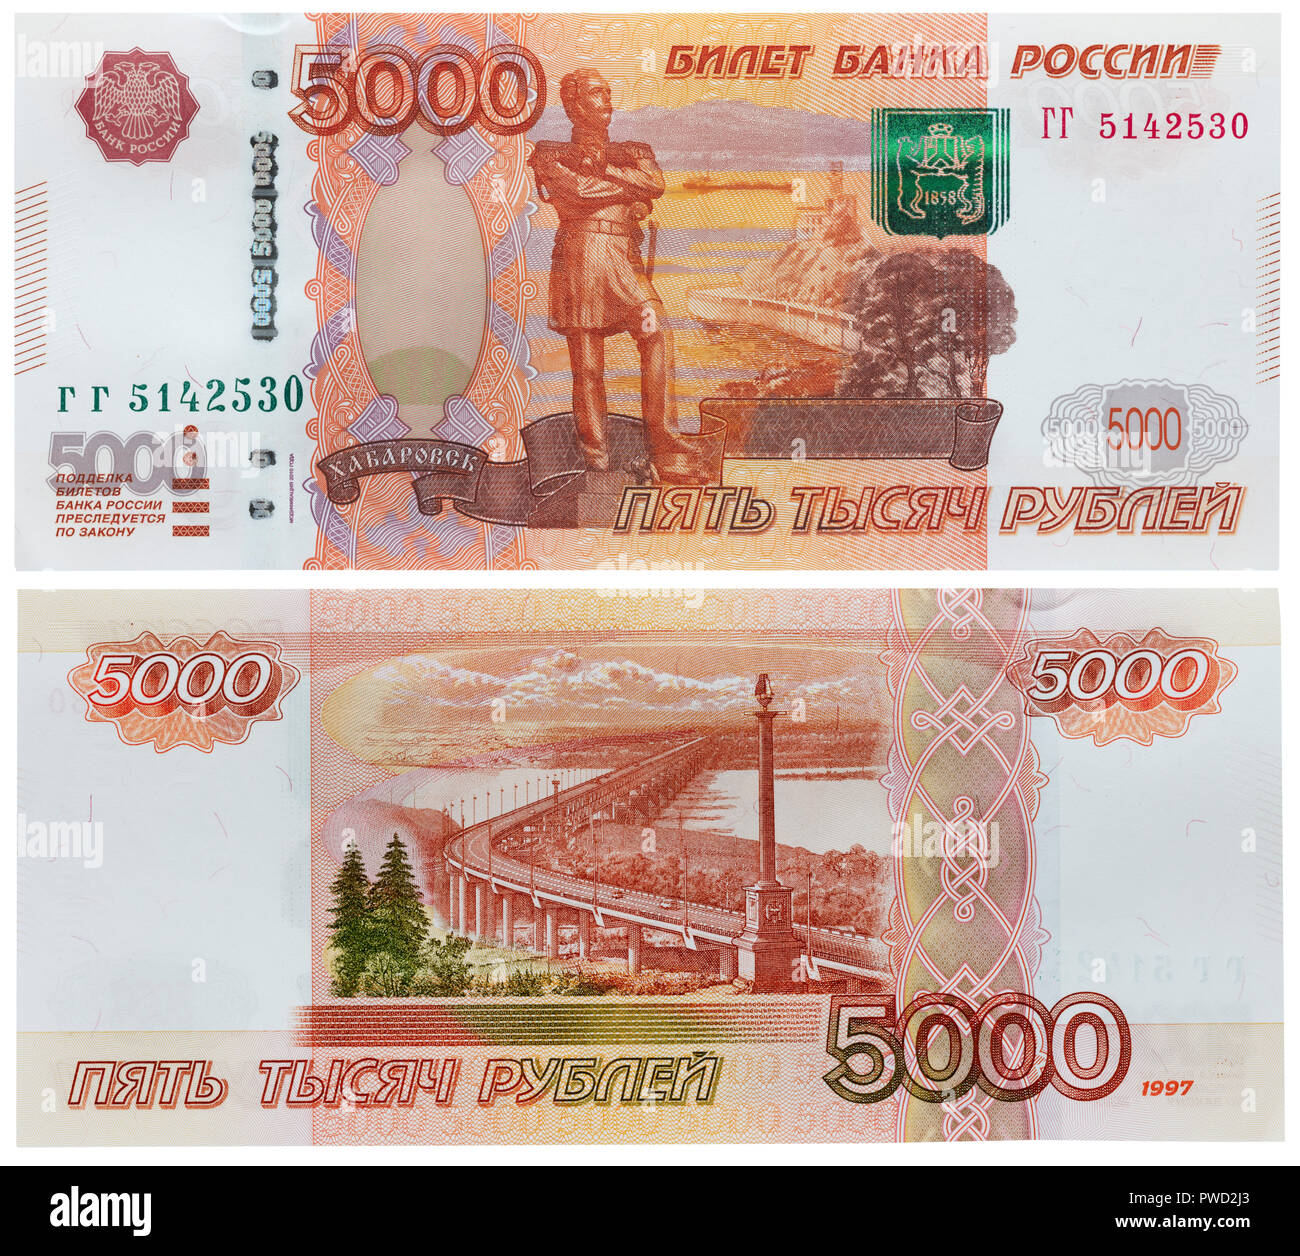 5000 rubles banknote, Monument to Nikolay Muravyov-Amursky, Khabarovsk, Bridge, Amur, Russia, 1997 - Stock Image